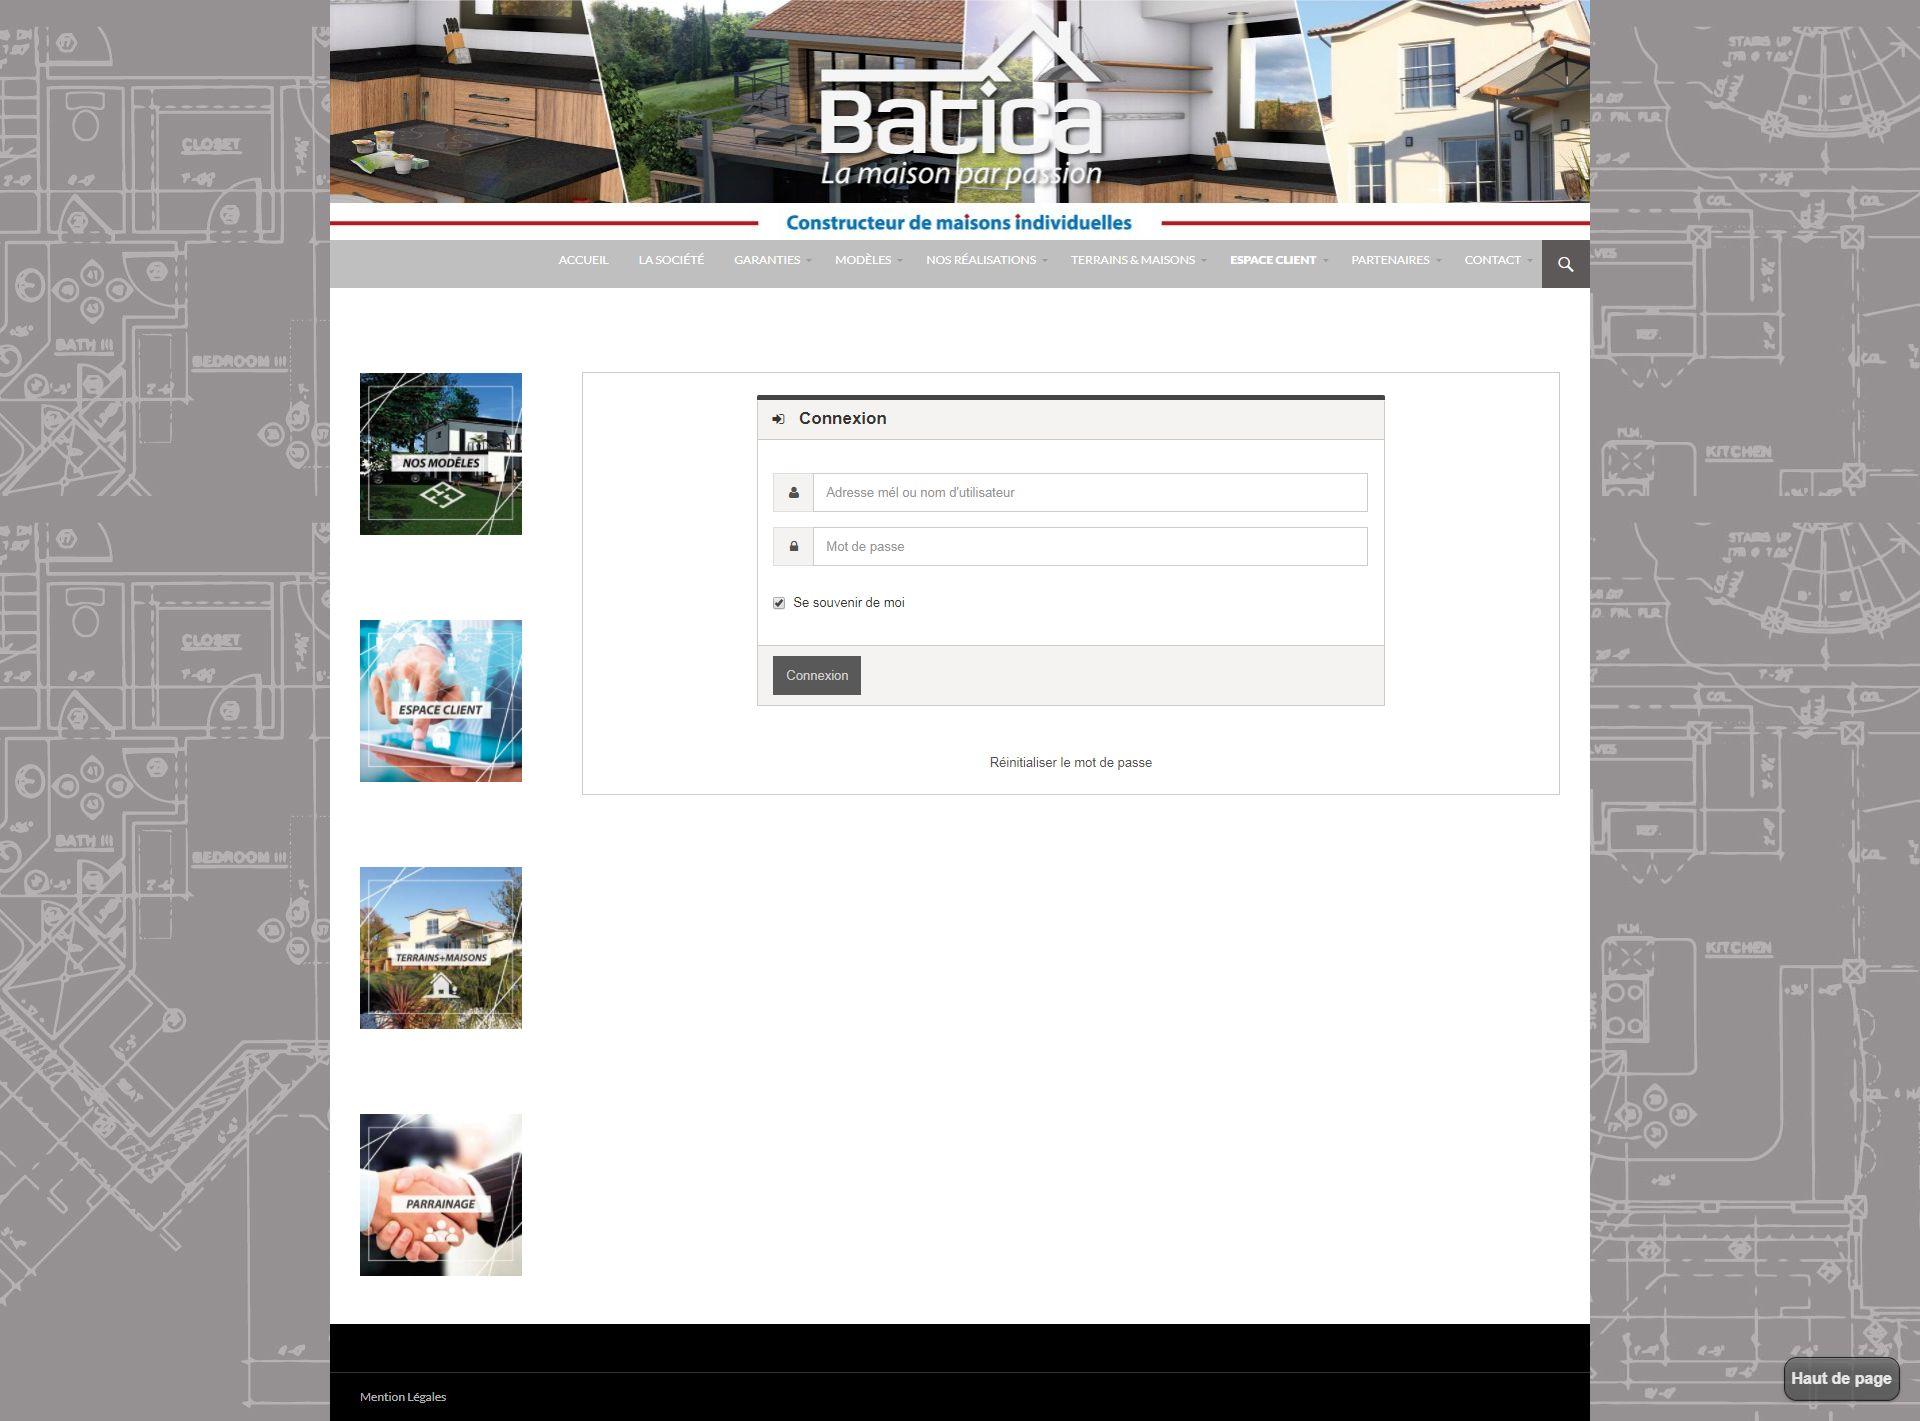 FireShot Pro Screen Capture #008 - 'Connexion I BA_' - www_batica33_fr_espace-client_connexion__redirect=www_batica33_fr_espace-client_tableau-de-bord